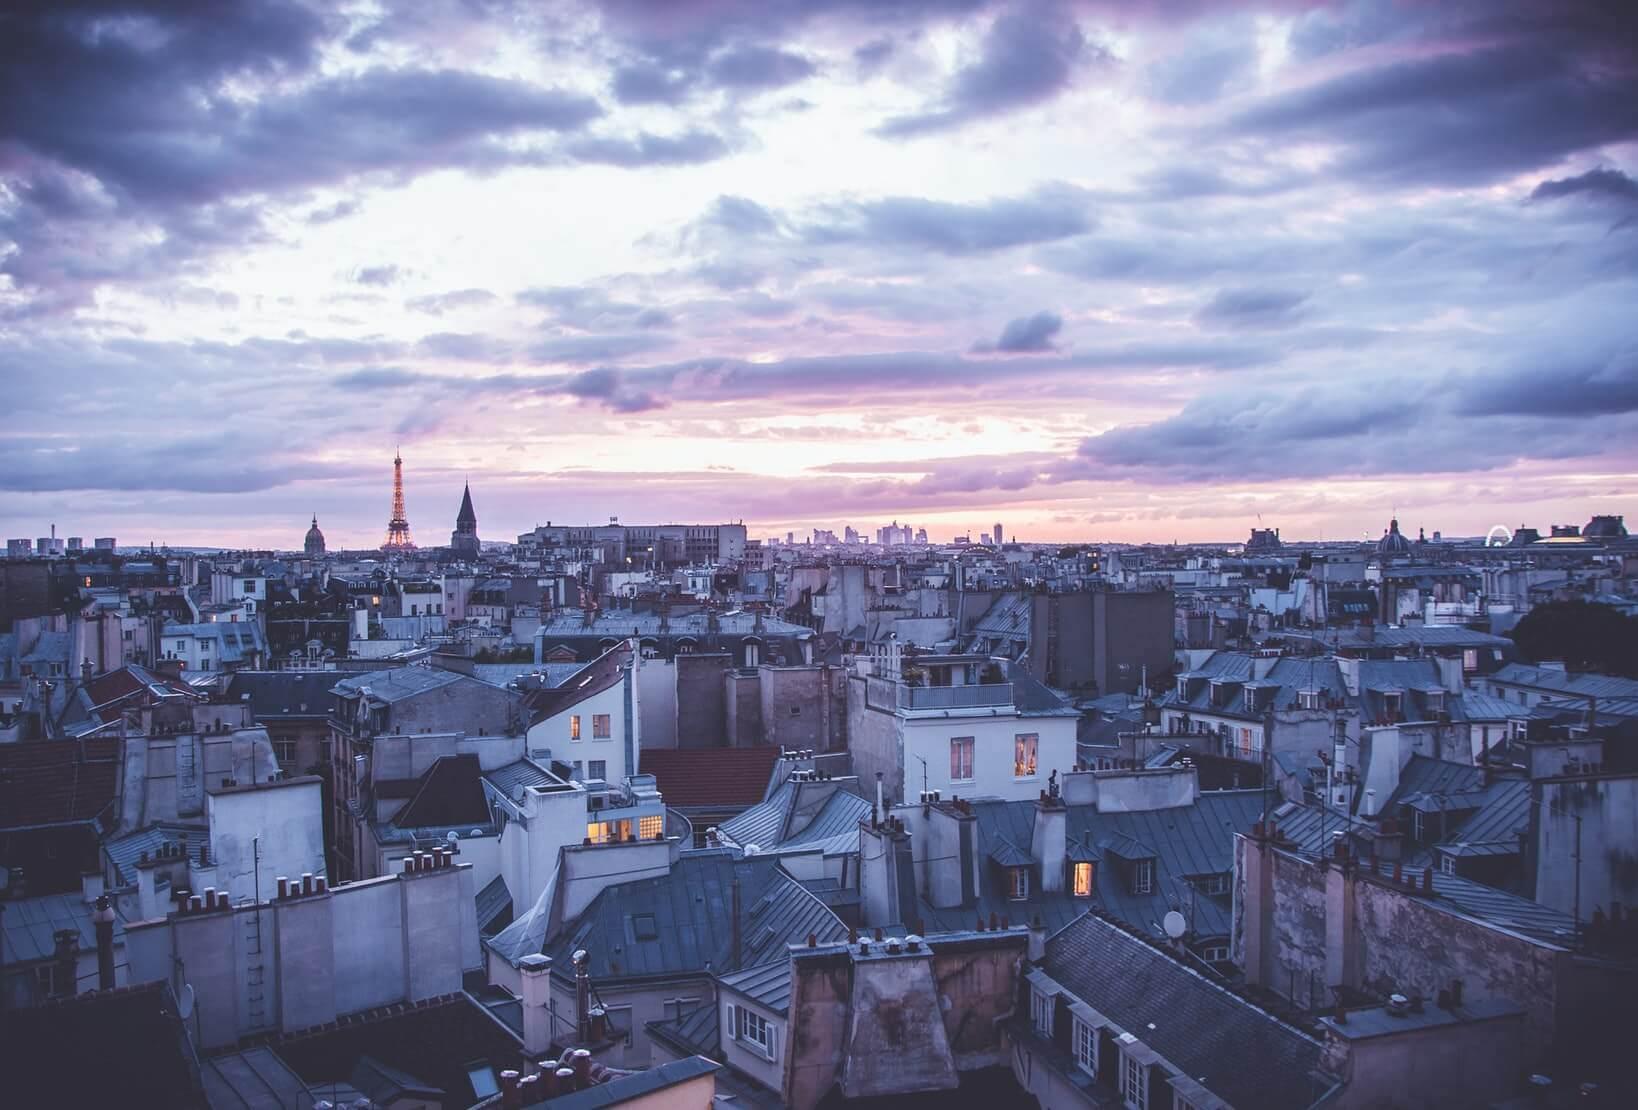 В Париже много фантастических тварей: гайд по местам съёмок